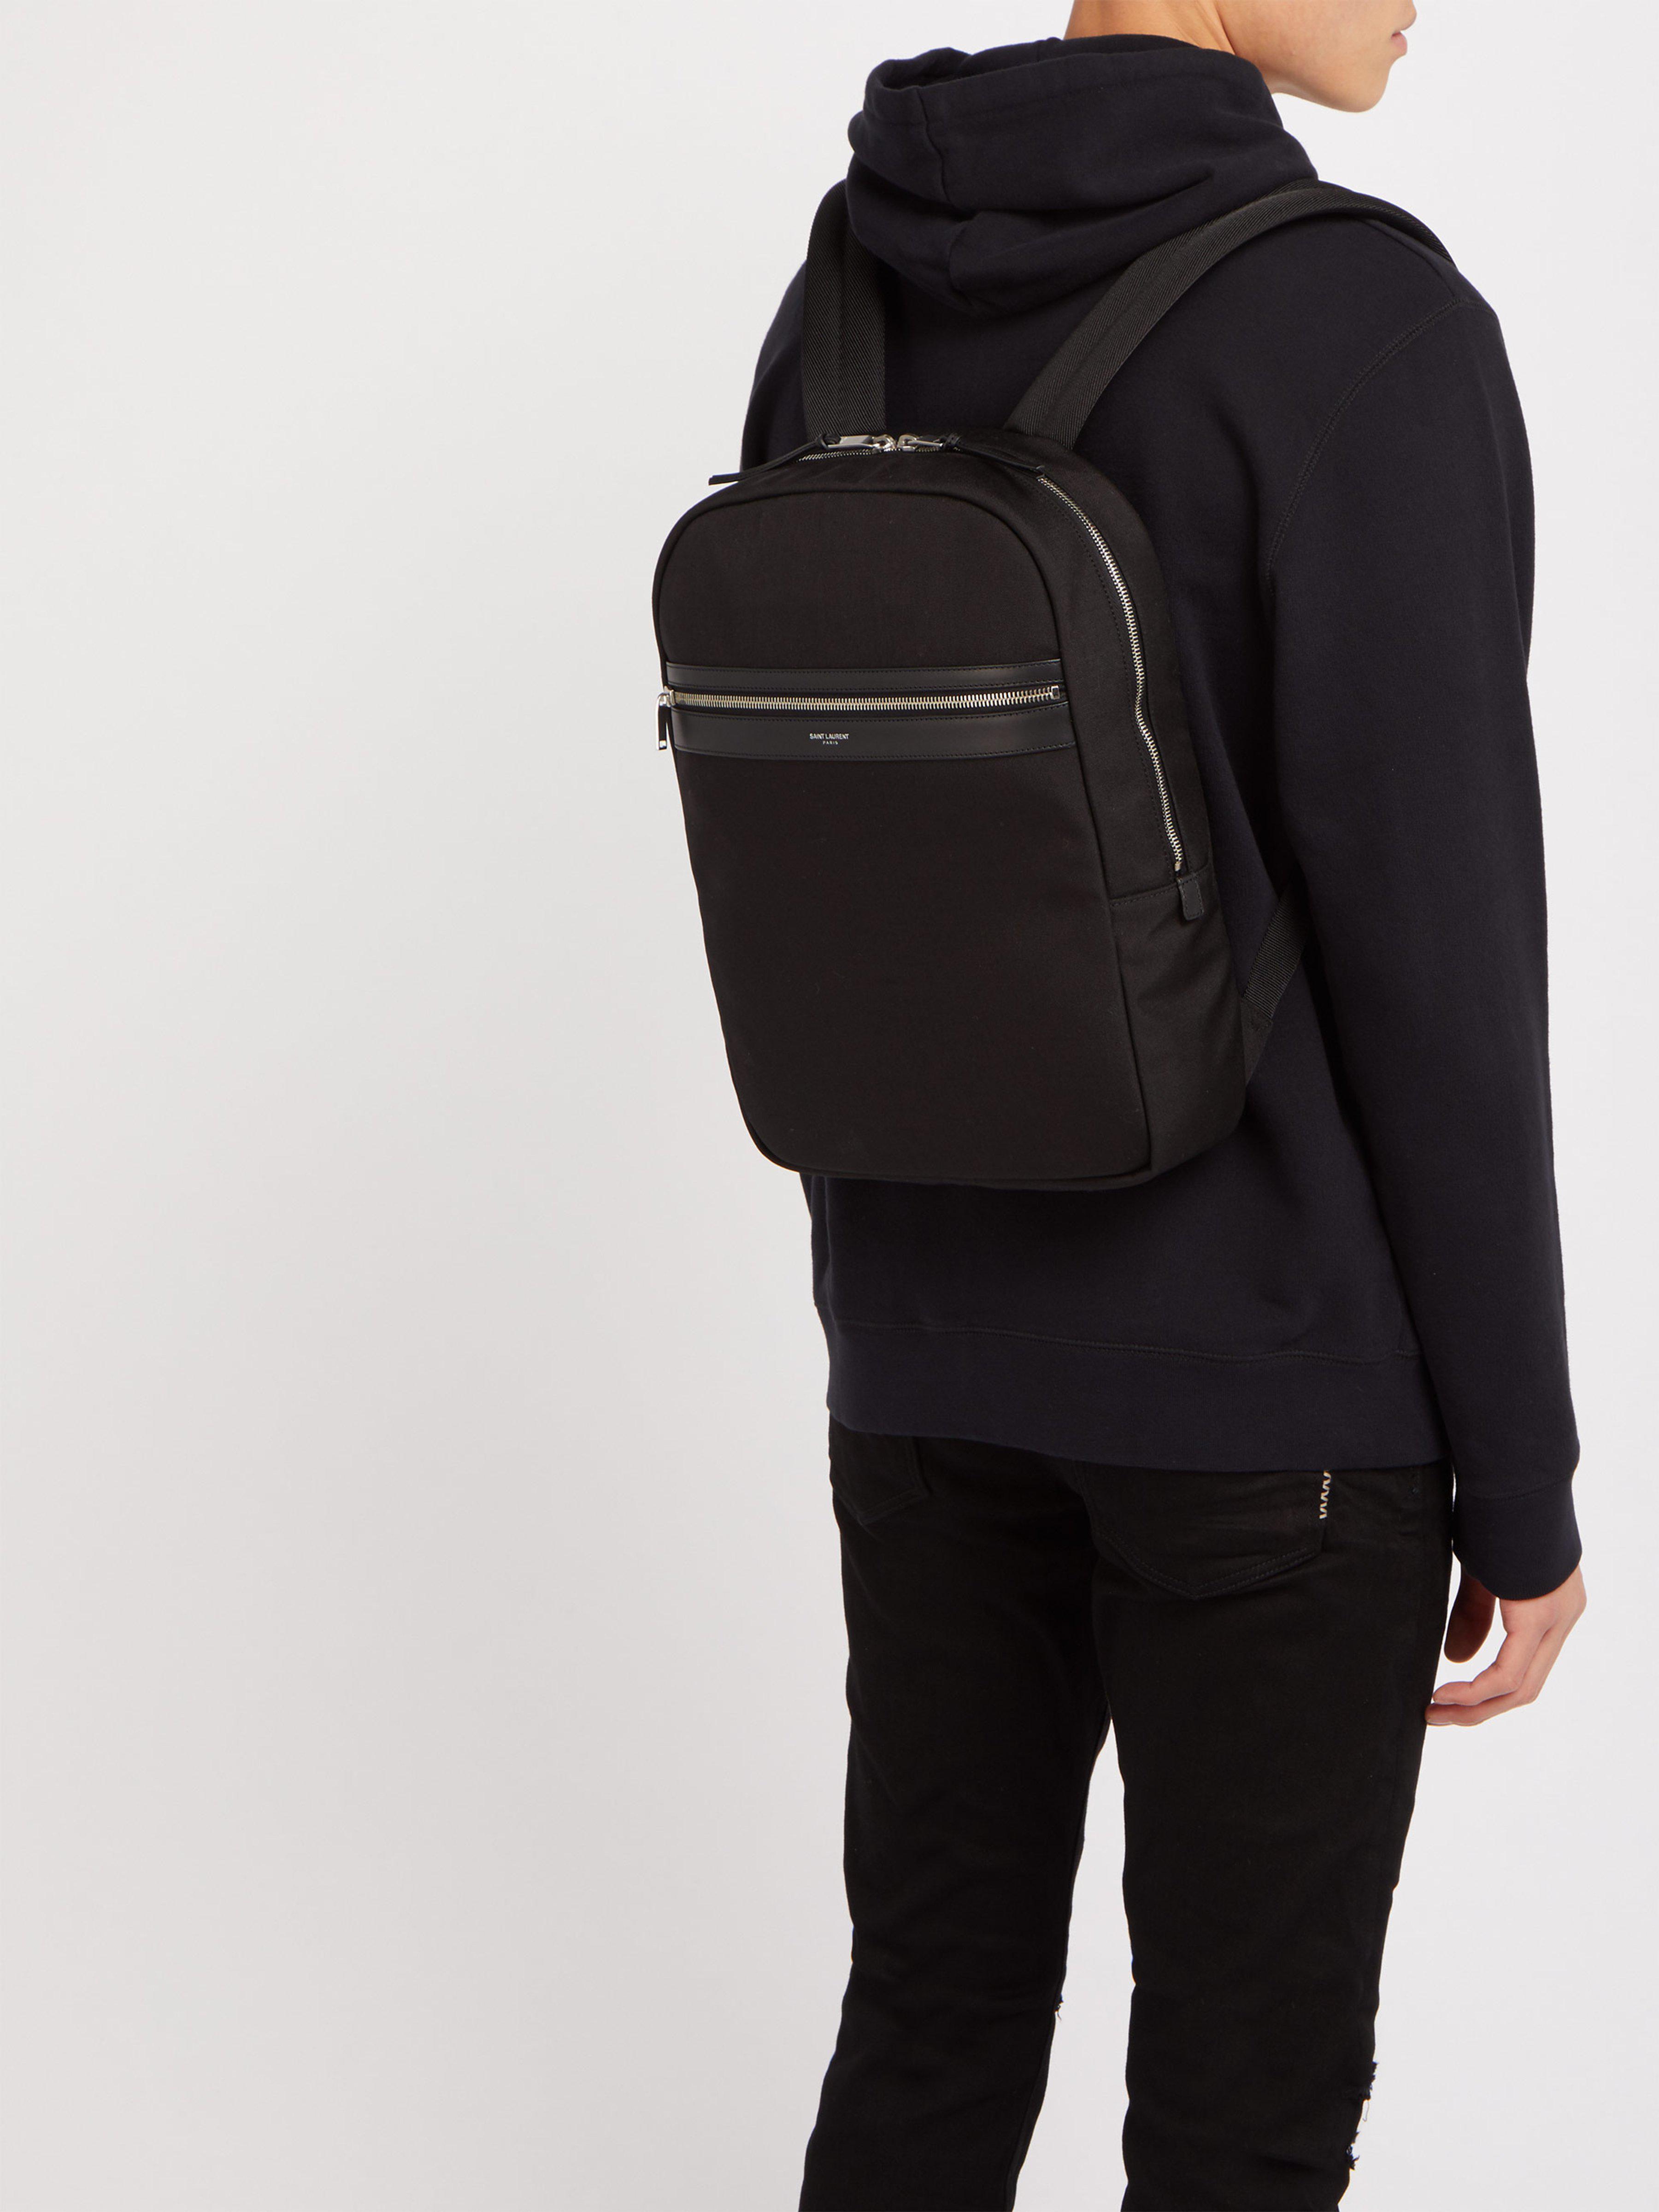 13fd86a17c Saint Laurent City Canvas Backpack in Black for Men - Lyst